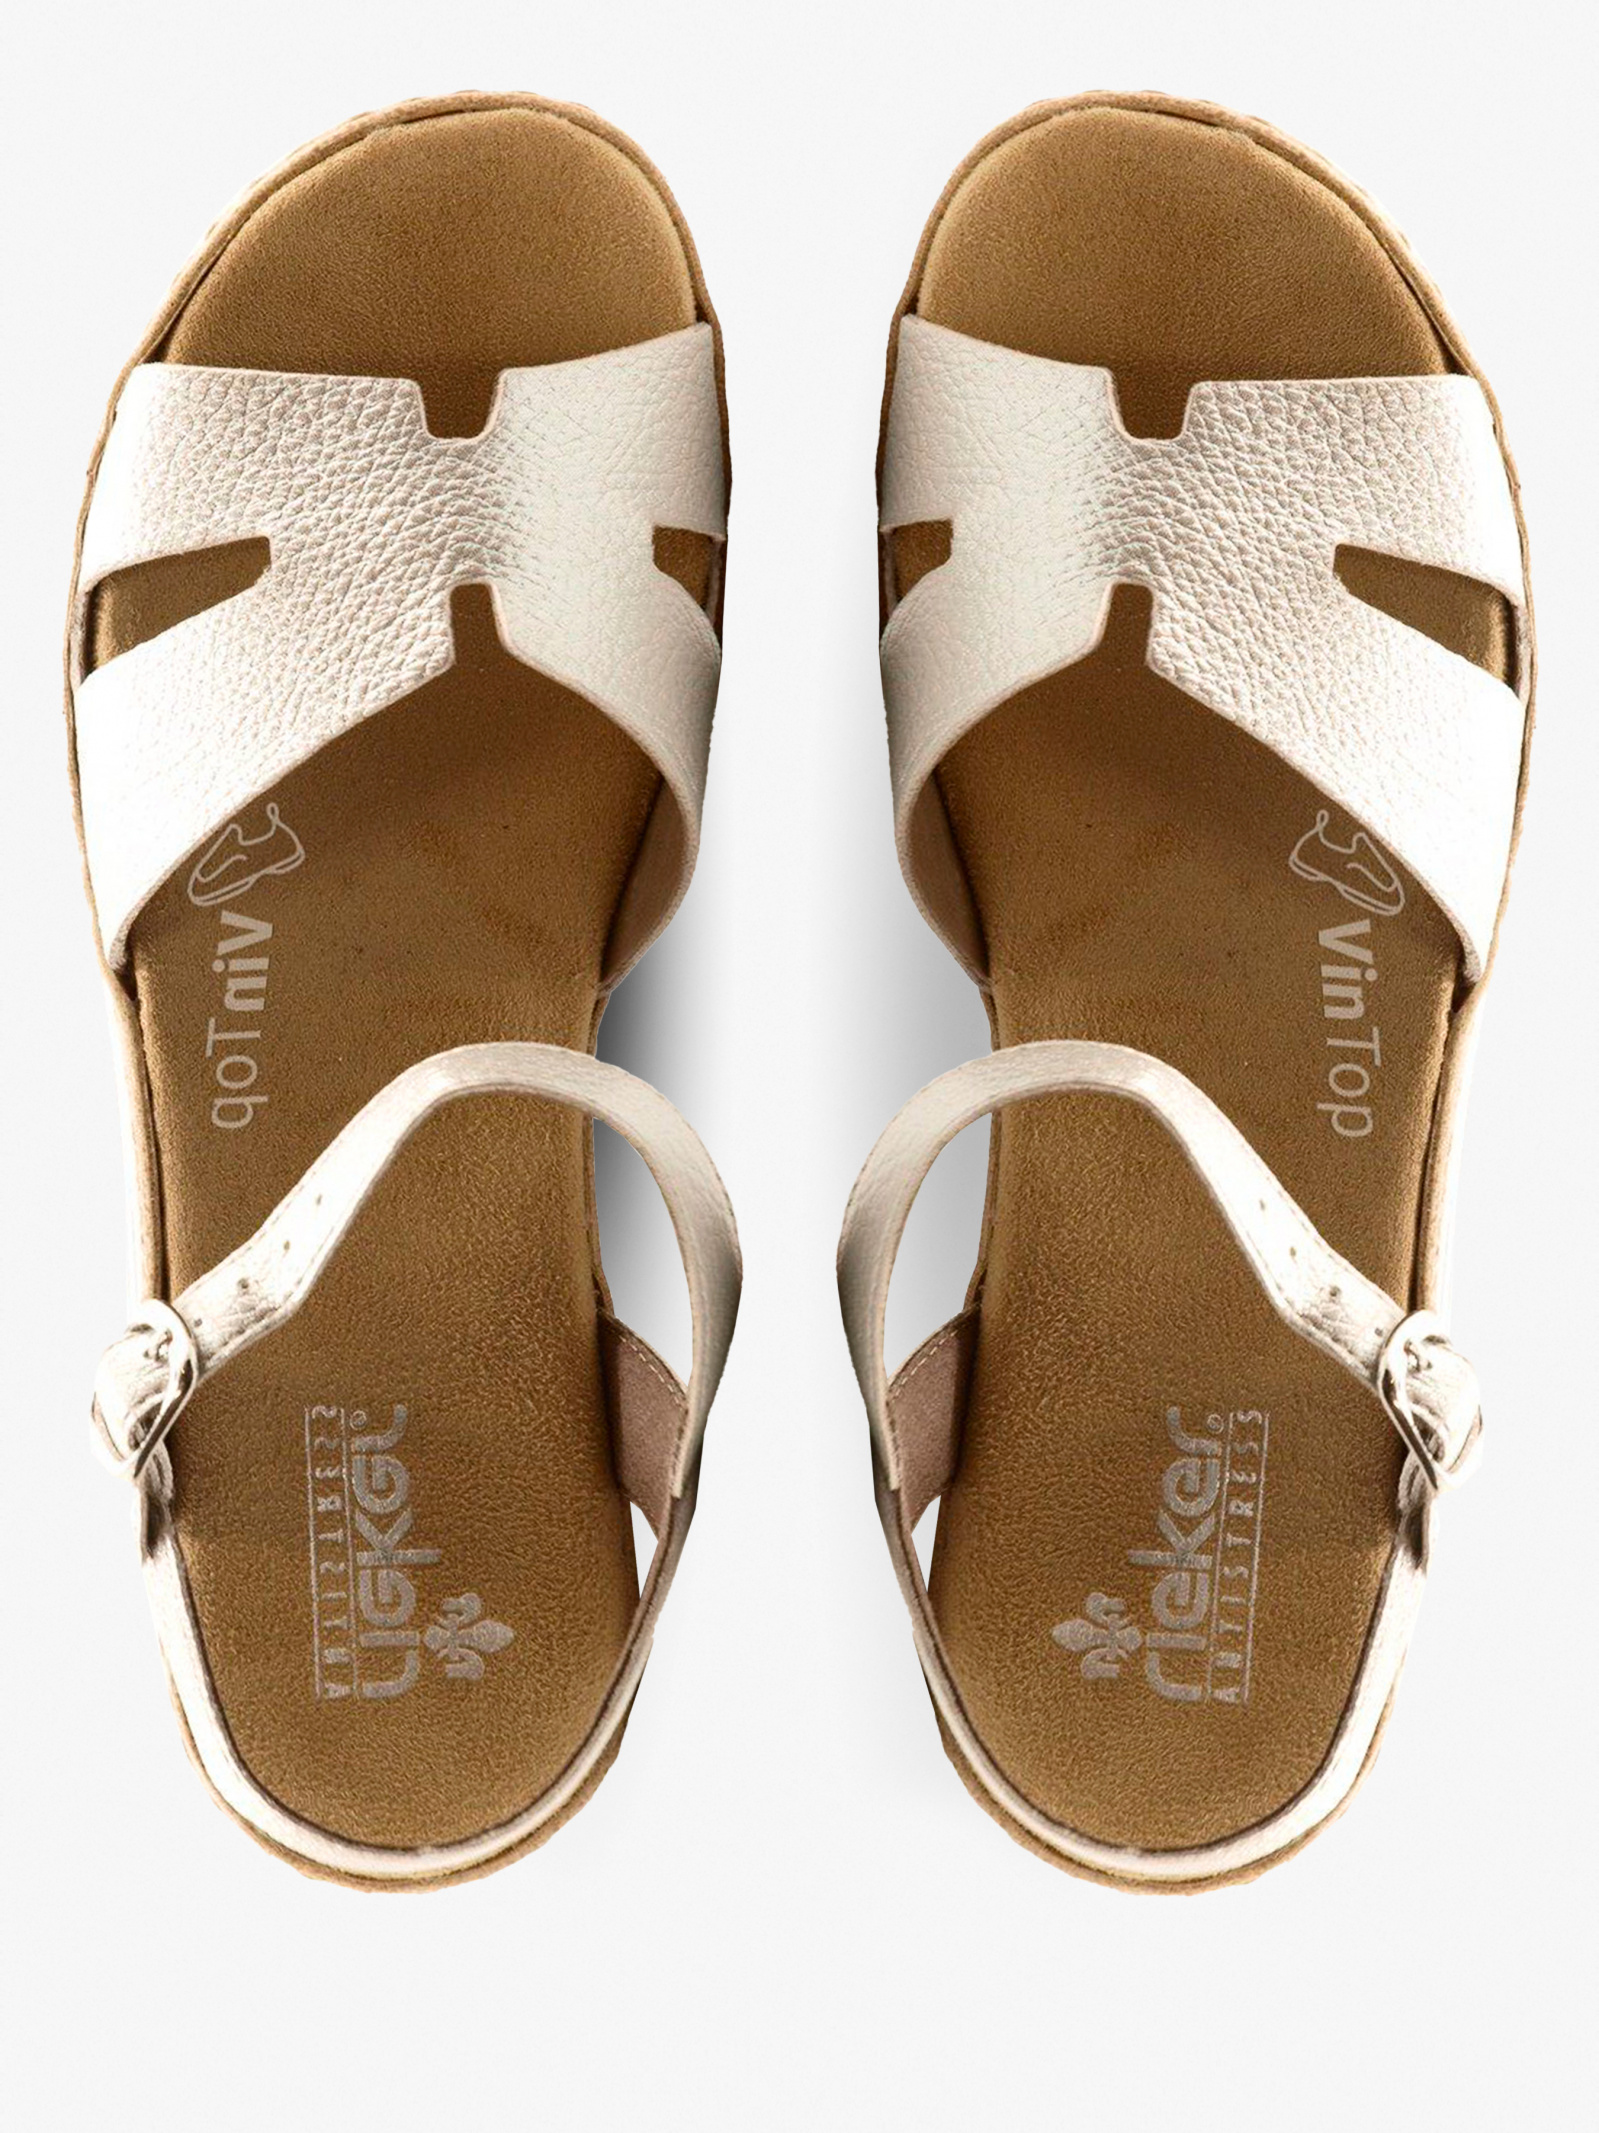 Сандалі  для жінок RIEKER V0254/90 модне взуття, 2017